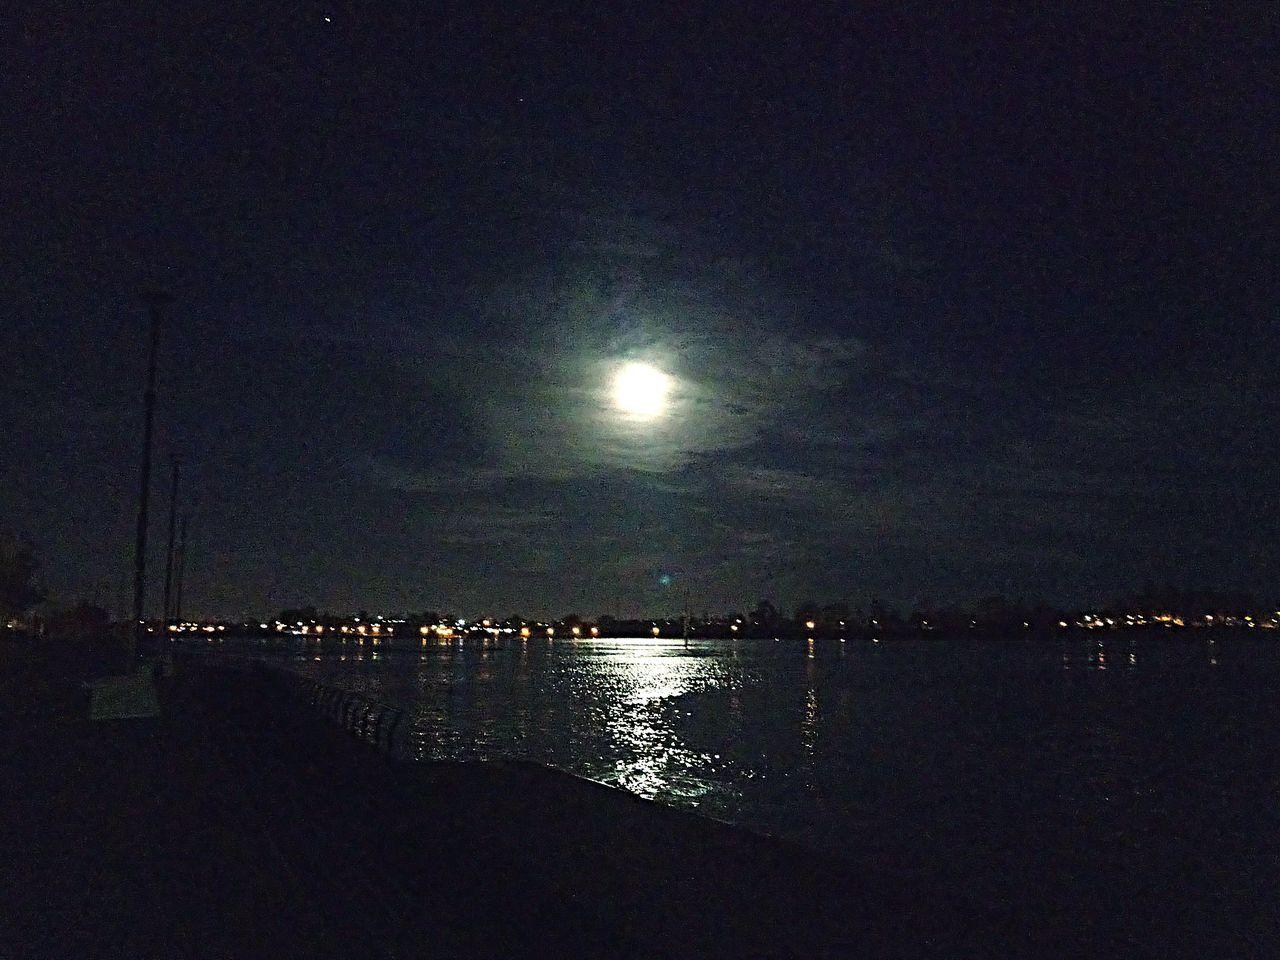 Night River Rio Costa Noche Moon Sky Moonlight Stars City